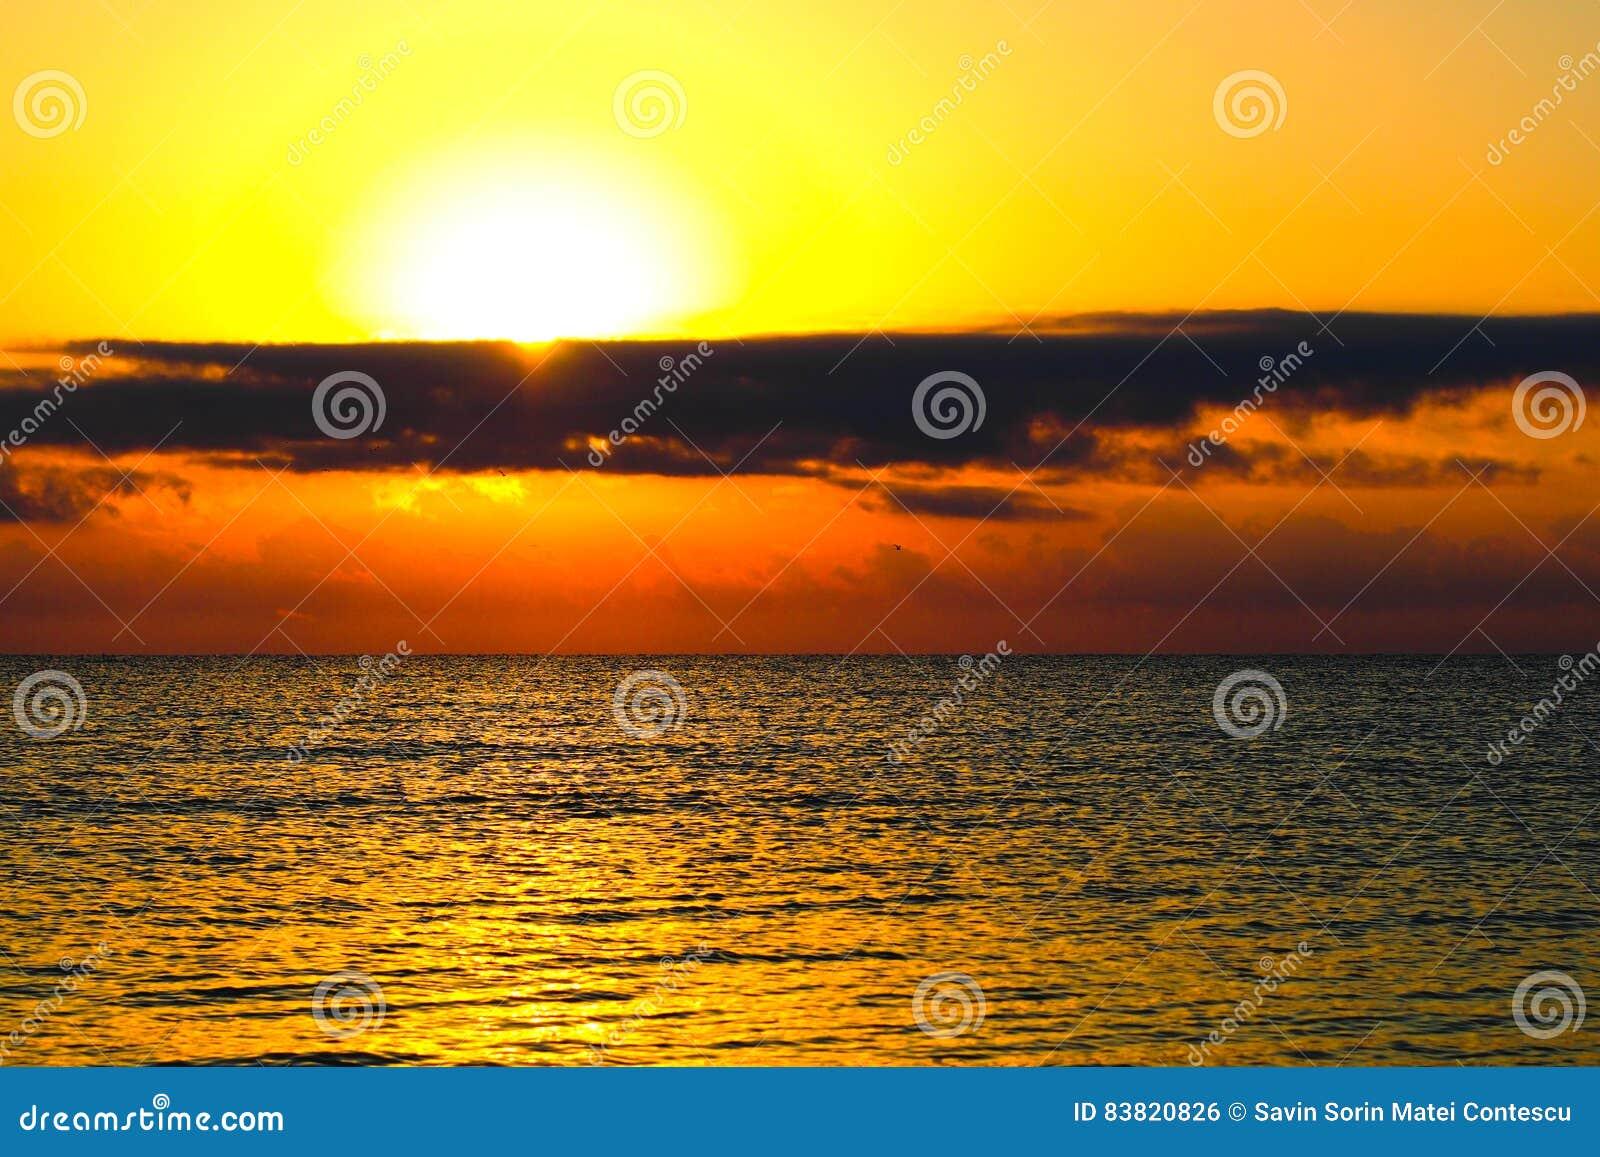 Beach in Romania at sunrise